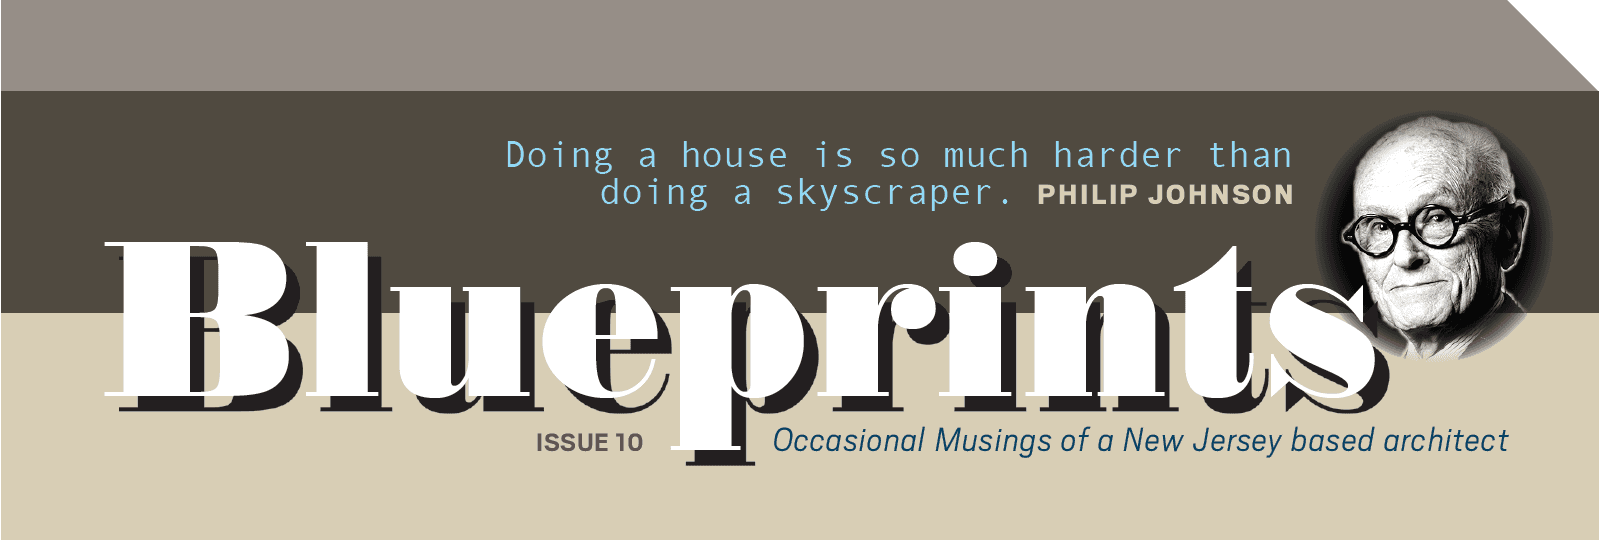 BLUEPRINTS, Yoga Practice, Architect's Practice, Design NJ Editors on Current Trends, A Fancy Face on a Humble Home